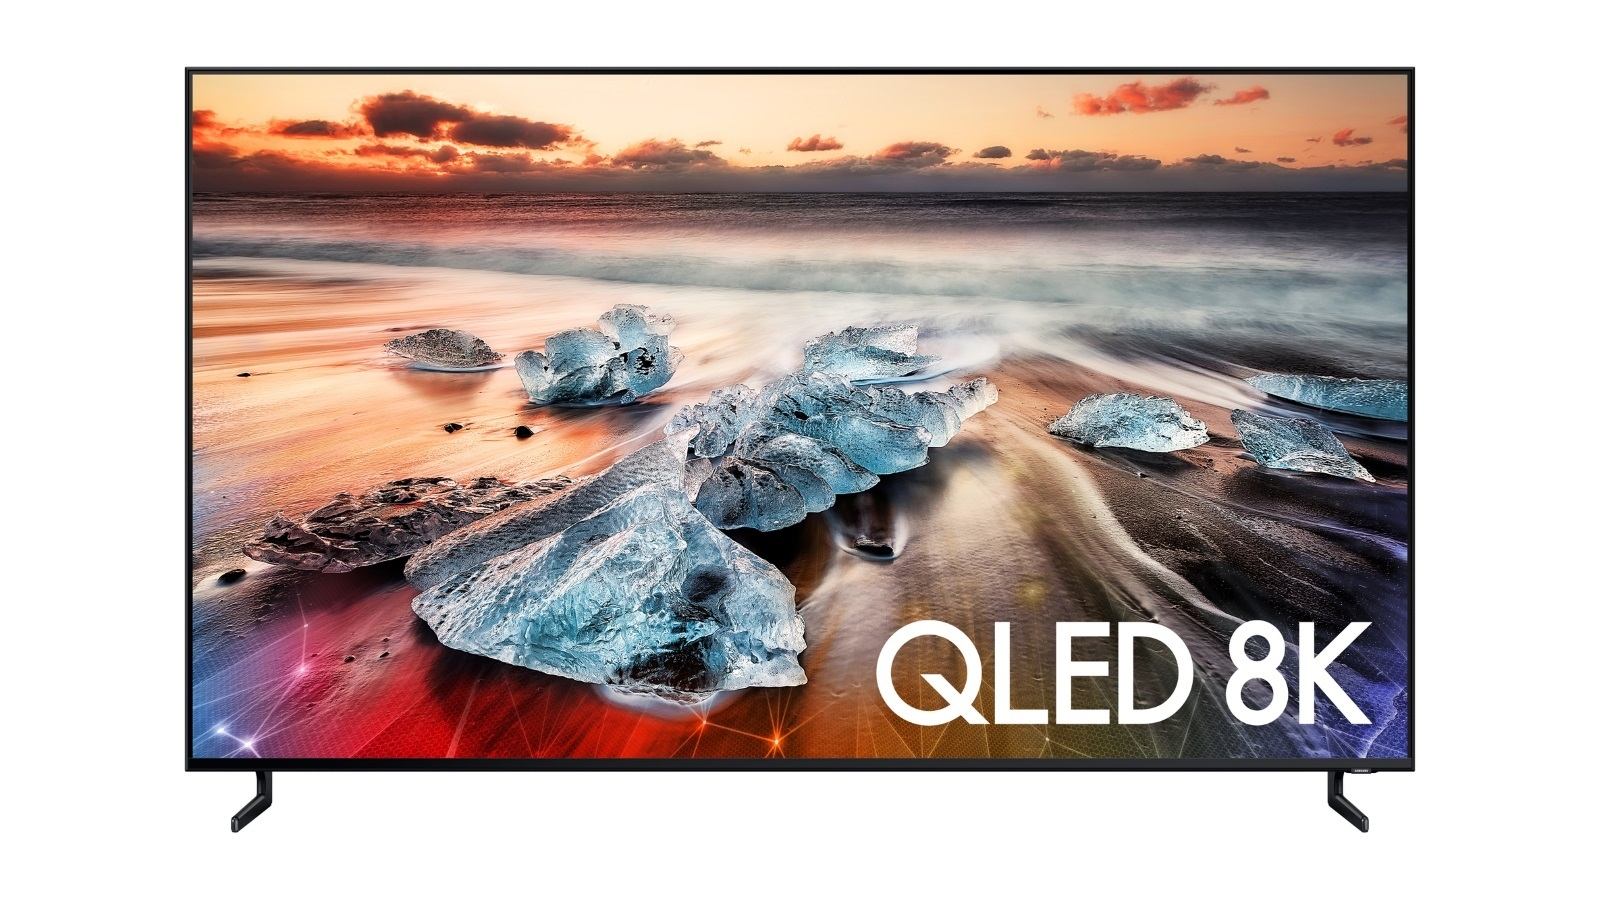 Samsung QA65Q900RBW 65inch UHD QLED TV